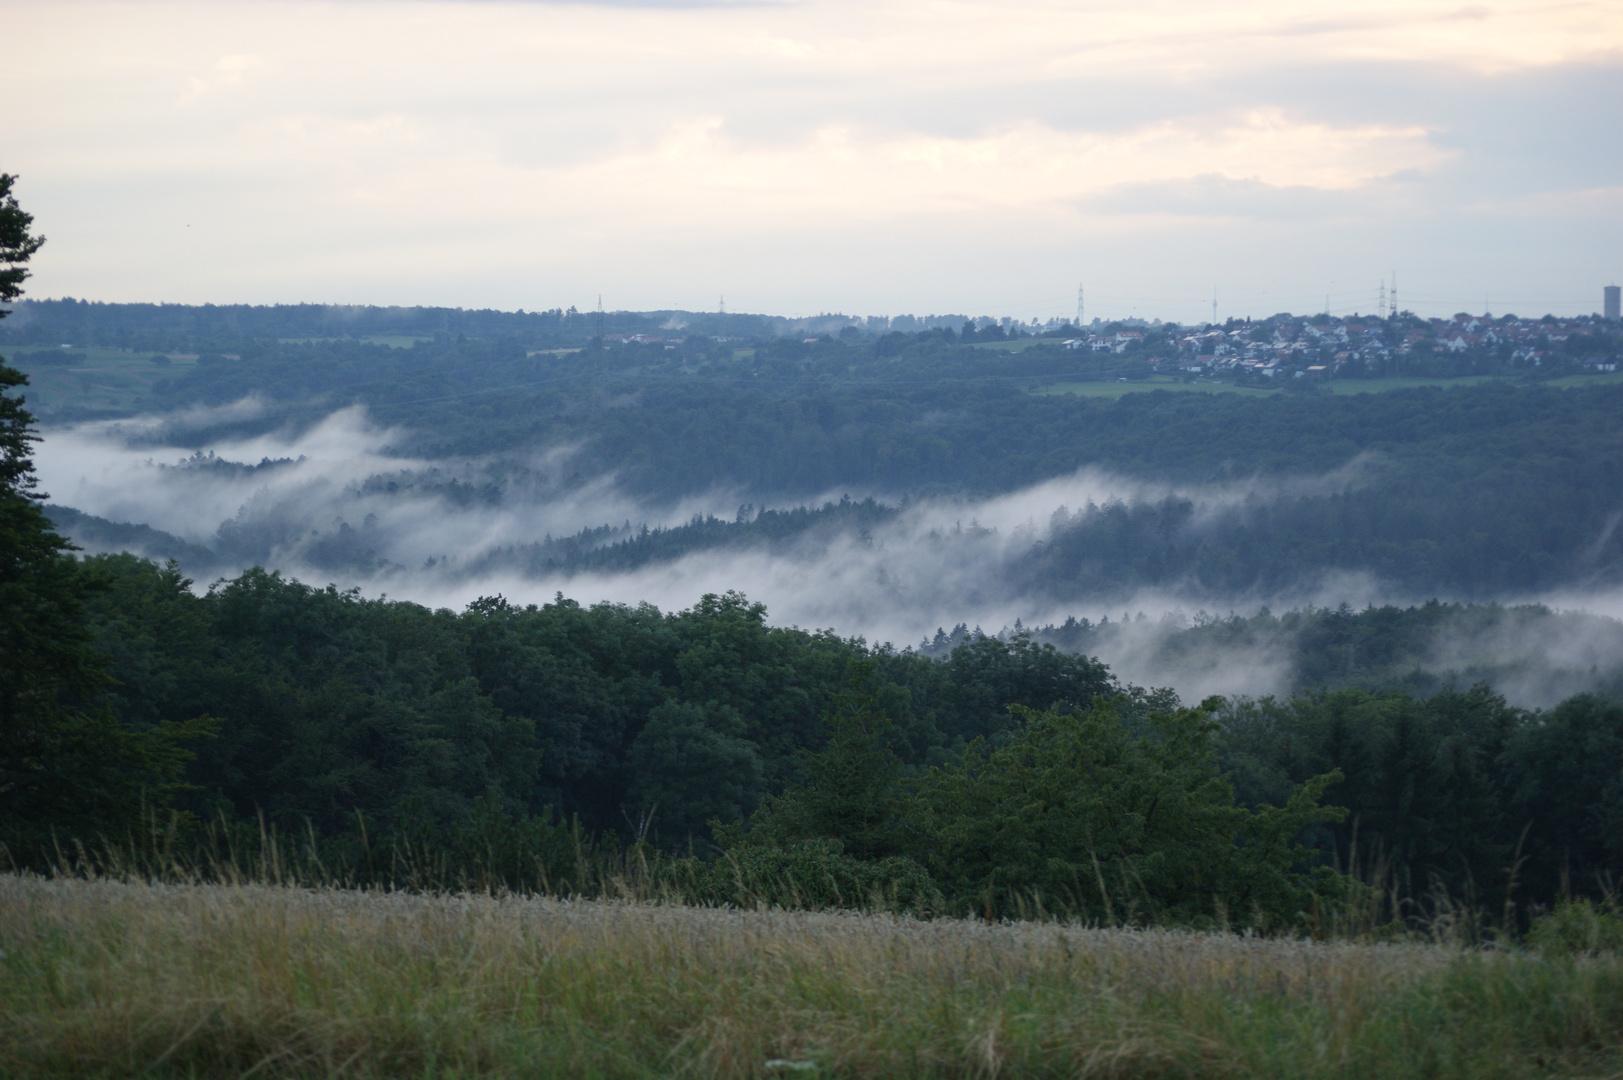 (Nebel des Grauens...)